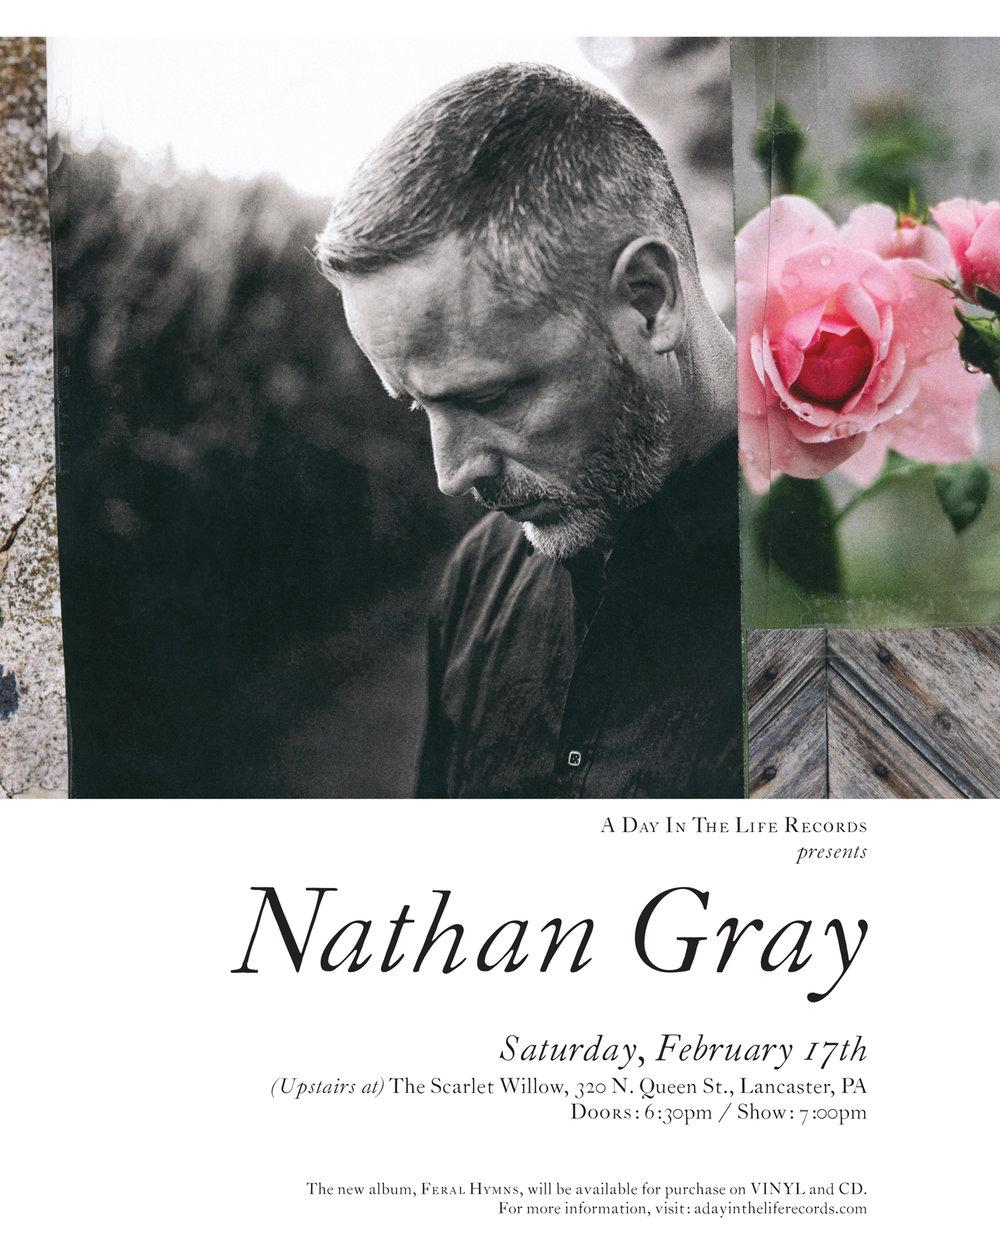 Gray.Nathan-ADITL_Graphic-1_20x25.jpg